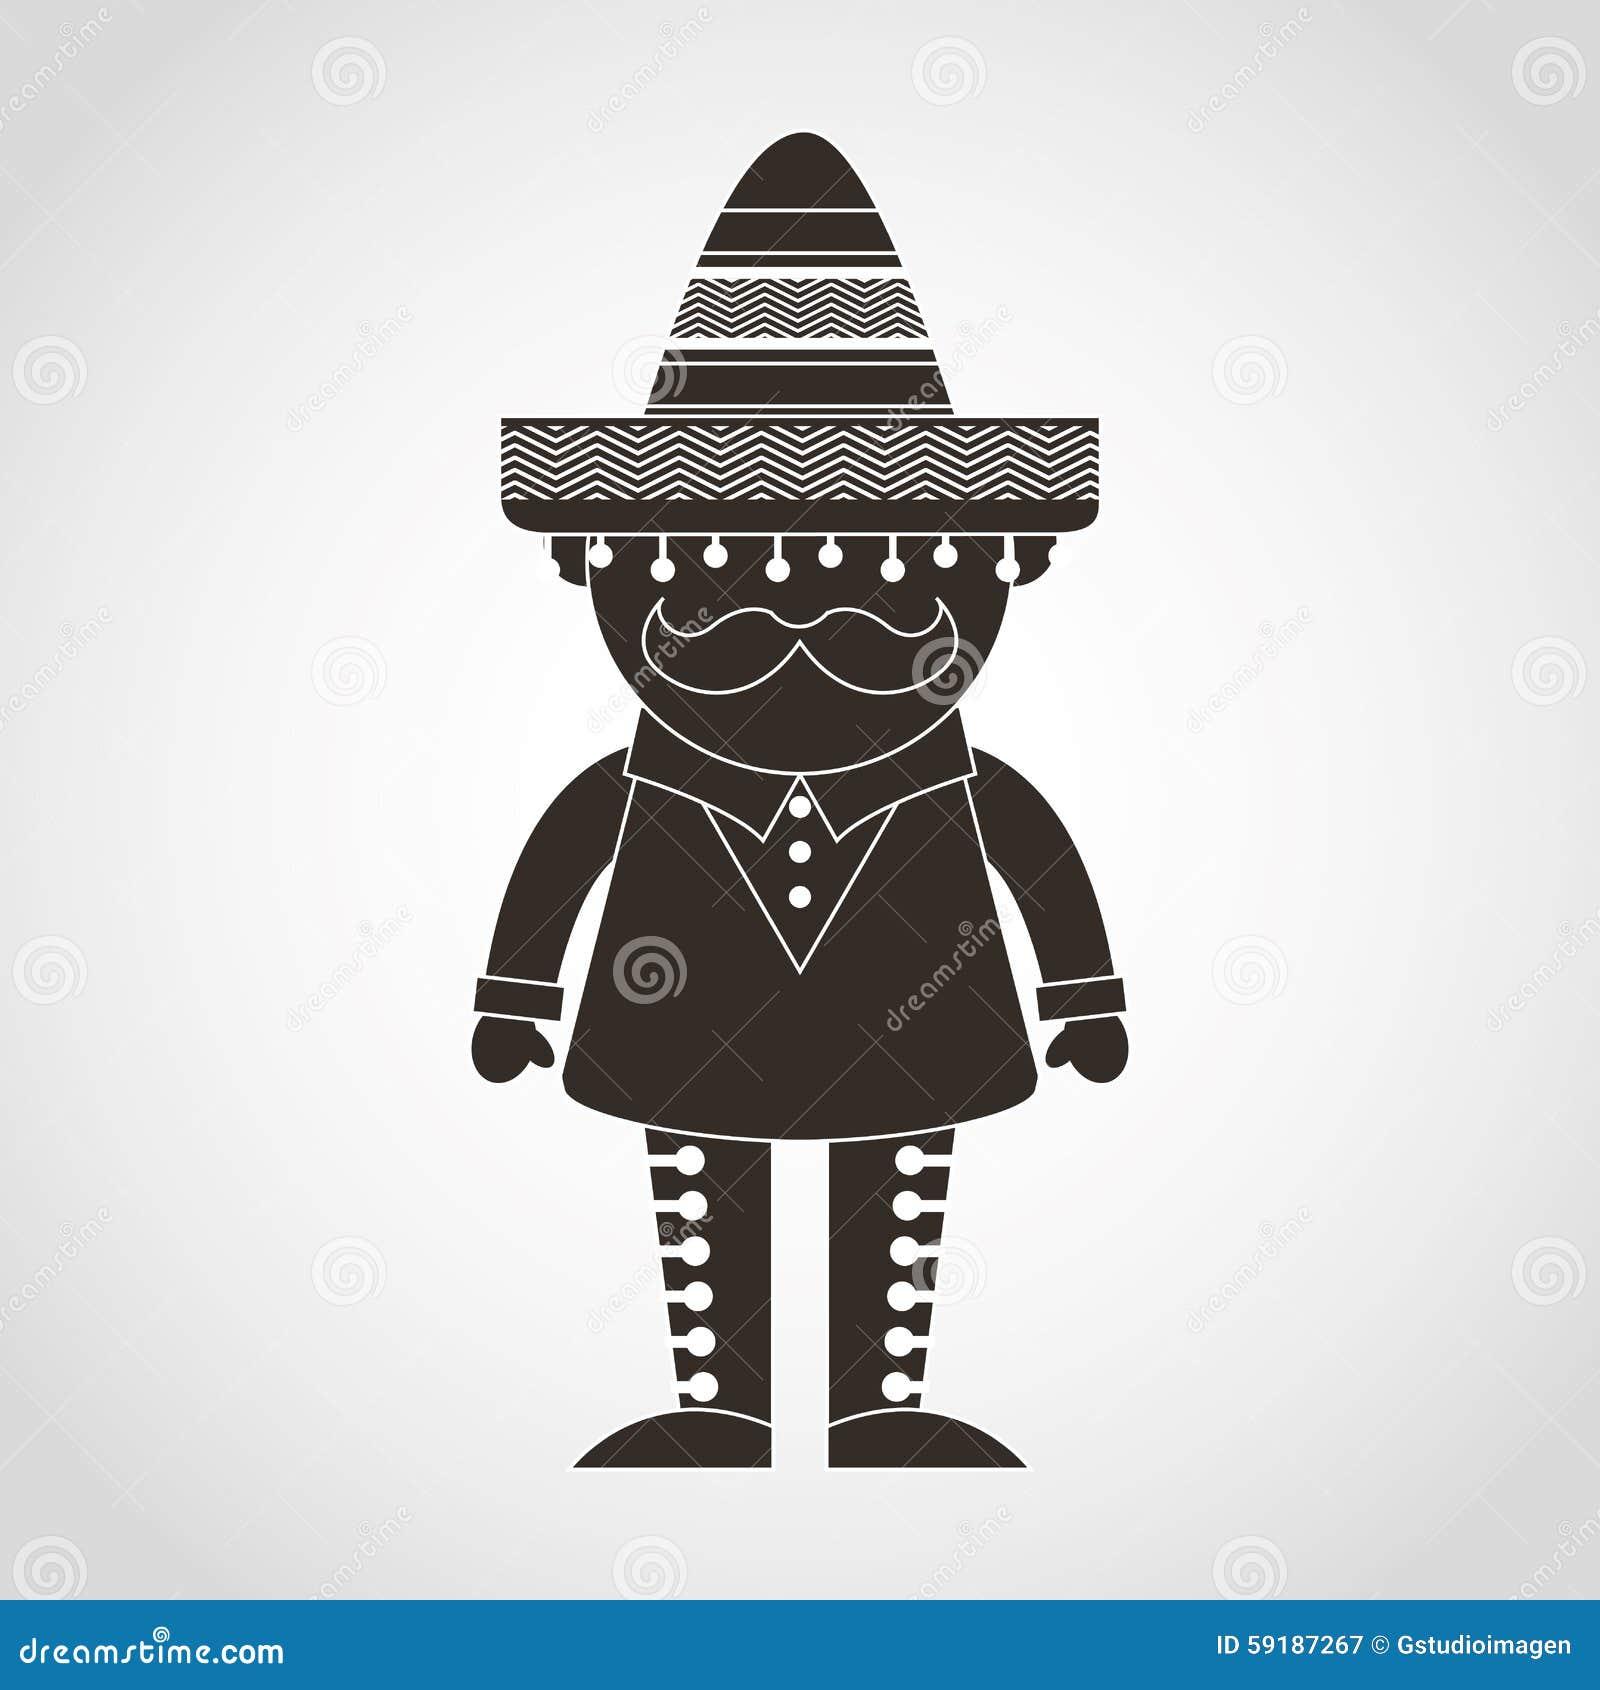 Mexican Man Stock Vector - Image: 59187267